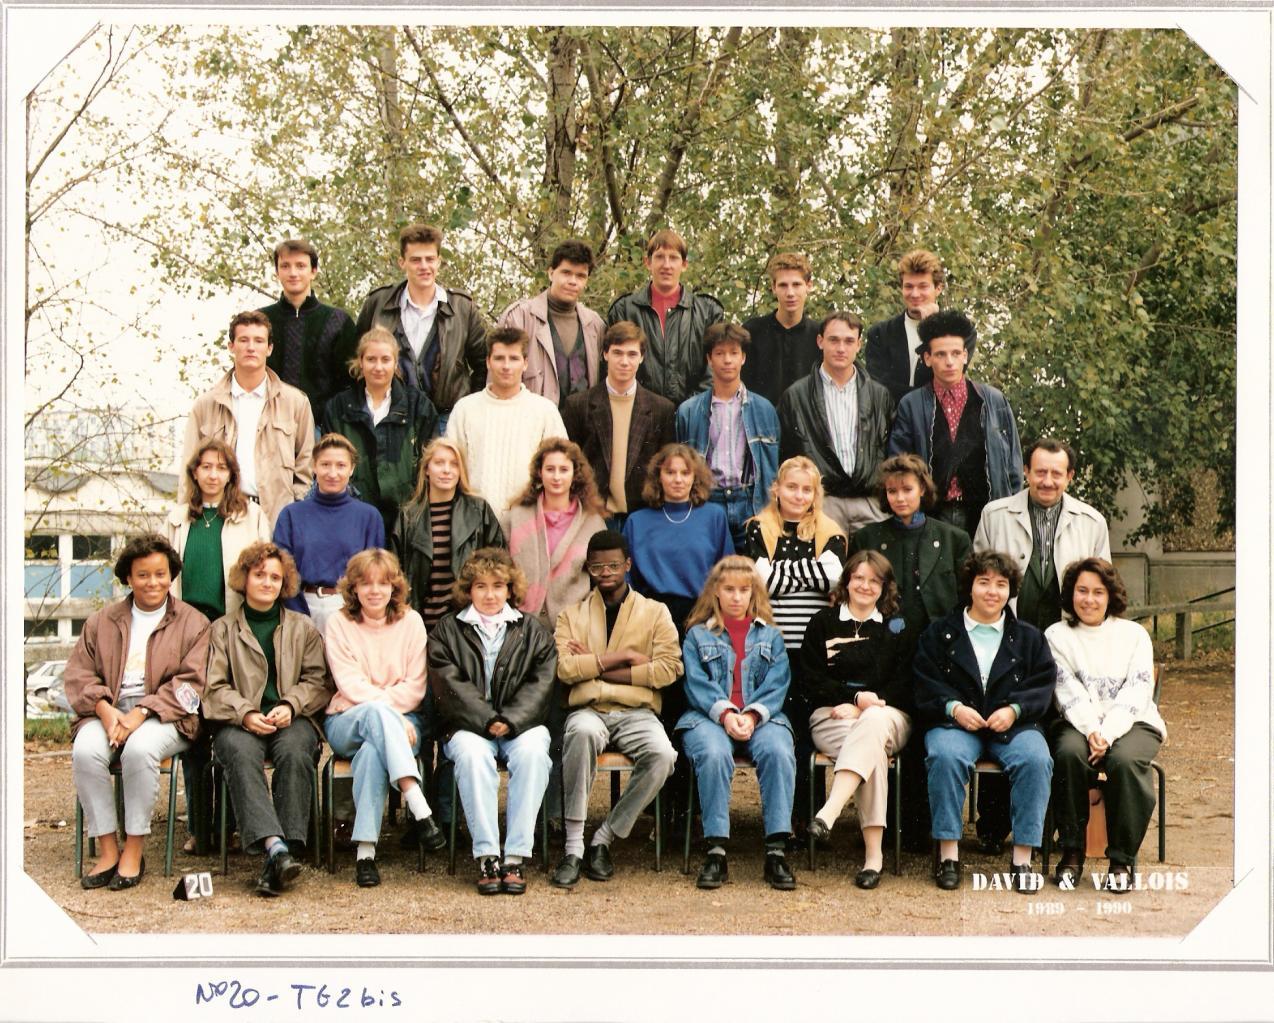 1990 - TG2